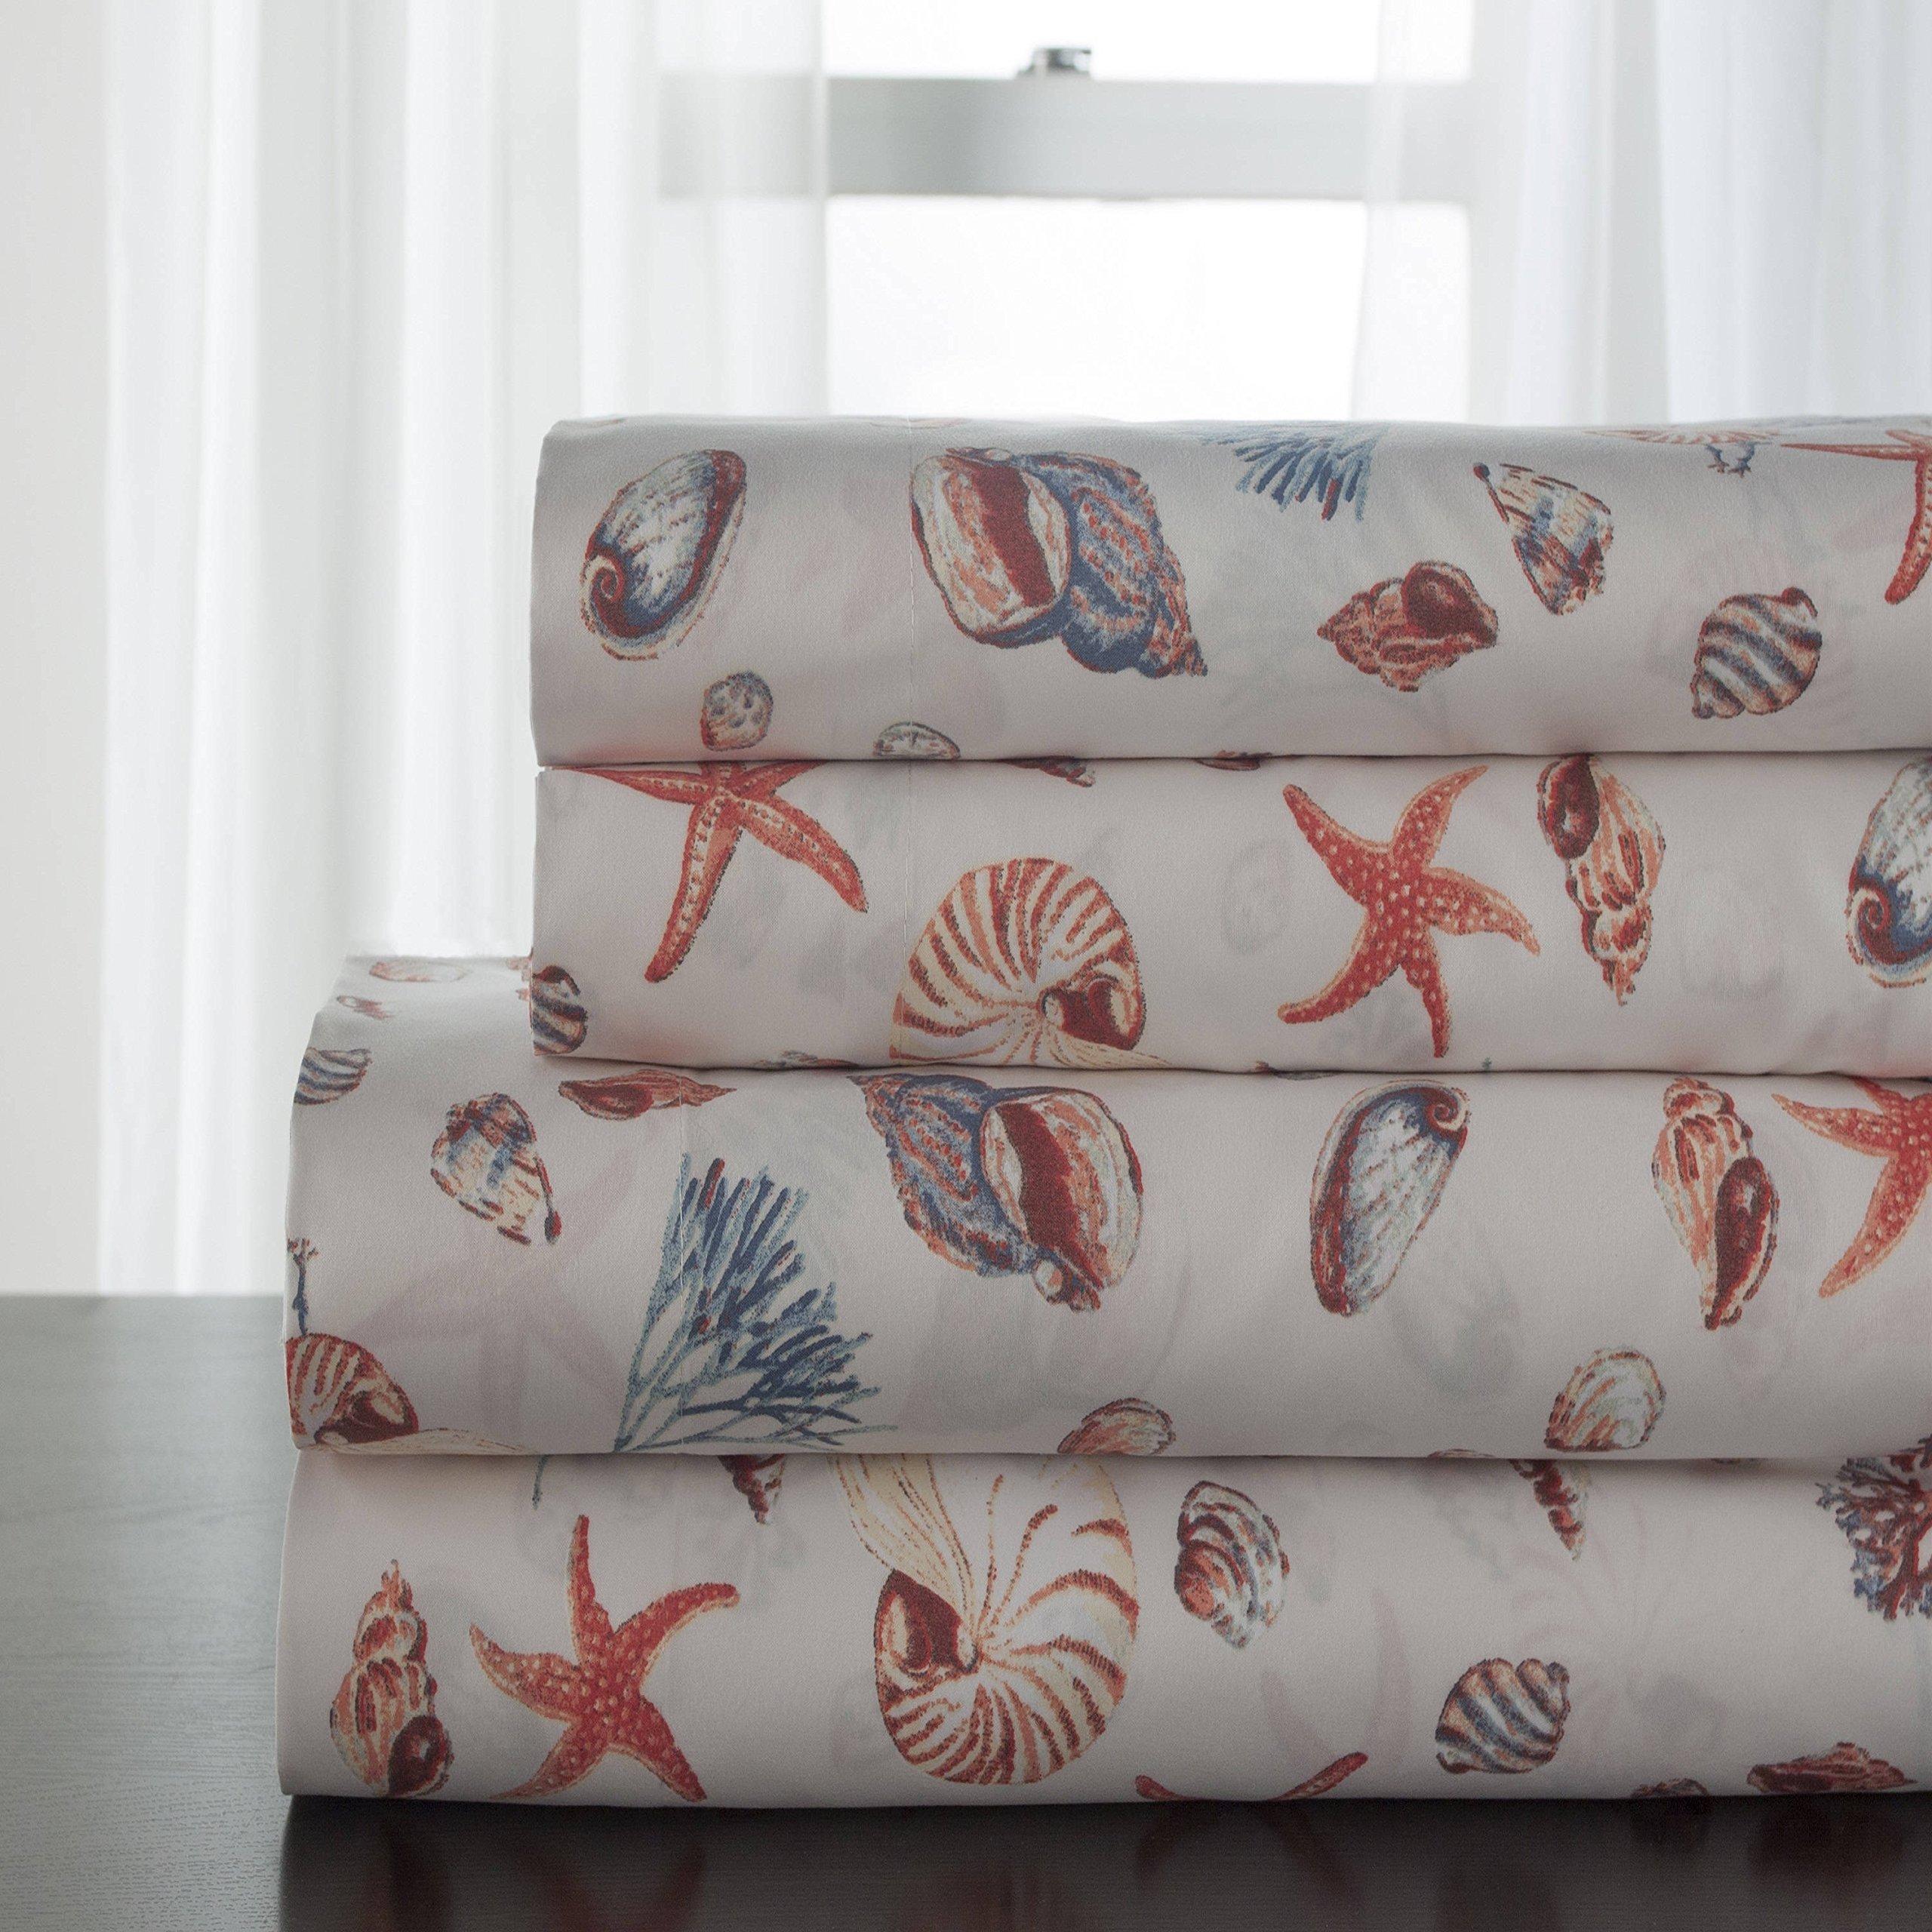 3 Piece Brown Oceanside Shells Themed Sheet Twin Set, Beautiful Deep Sea Animals Pattern Bedding, Features Startfish, Coral Floral Print, Sealife Theme Design, Vivid Colors, Microfiber, Unisex